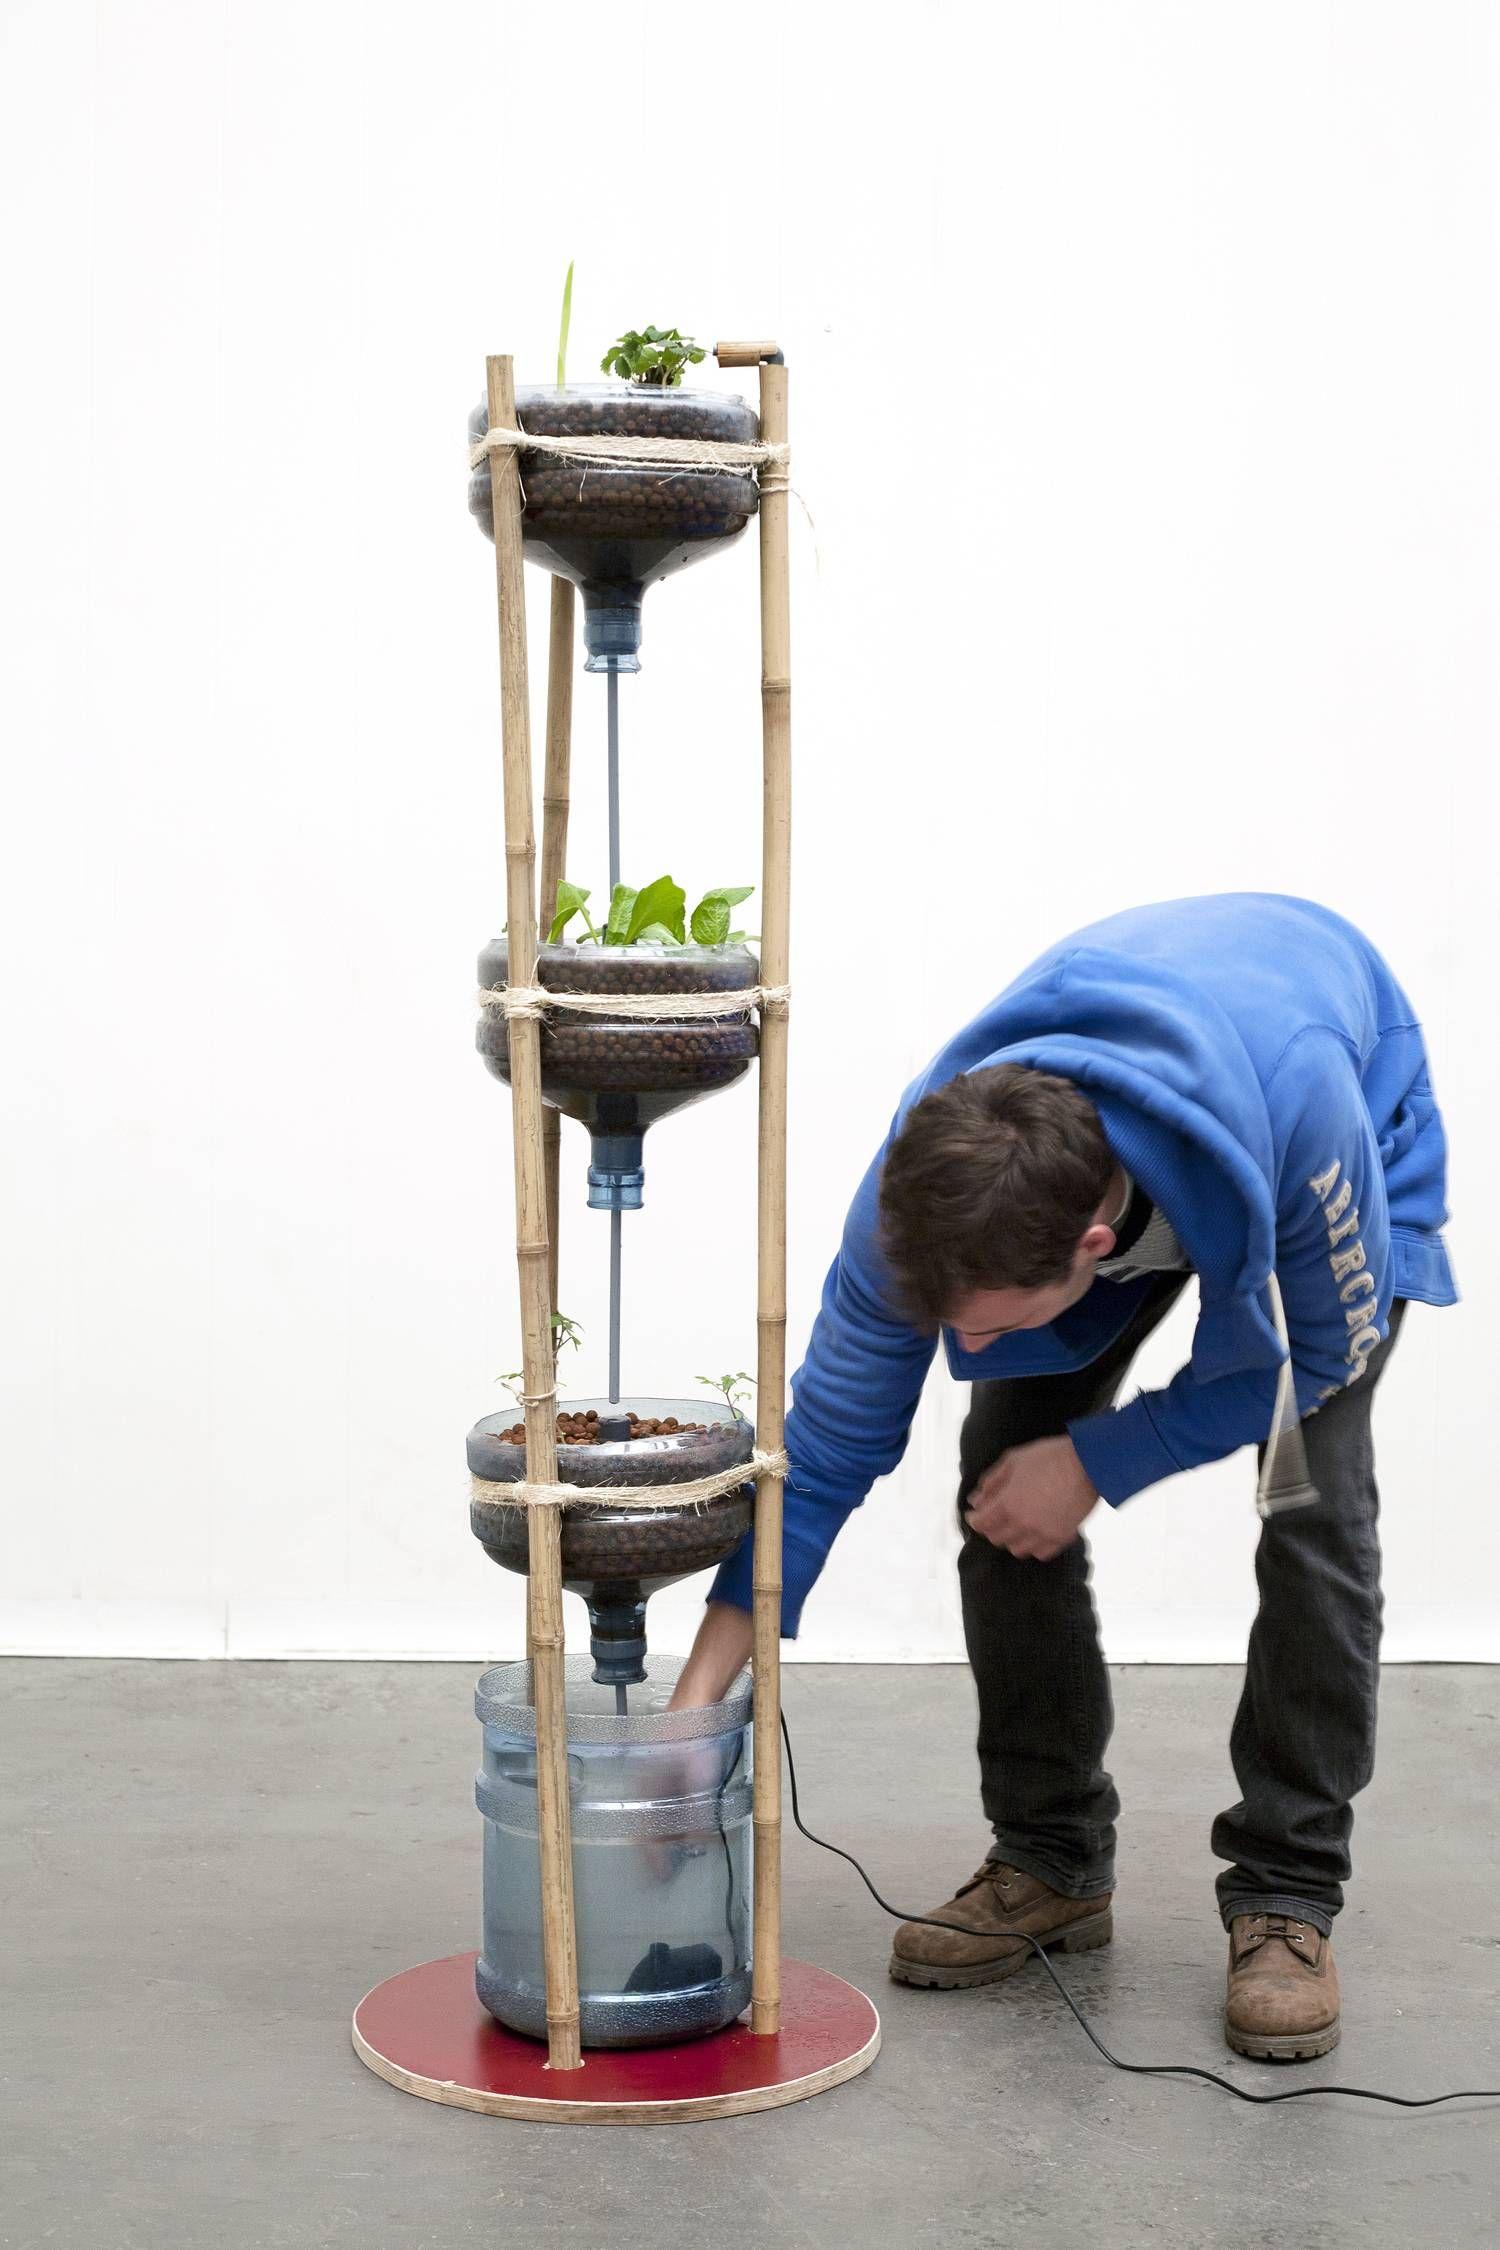 Do it yourself aquaponics. DIY Vertical garden diy